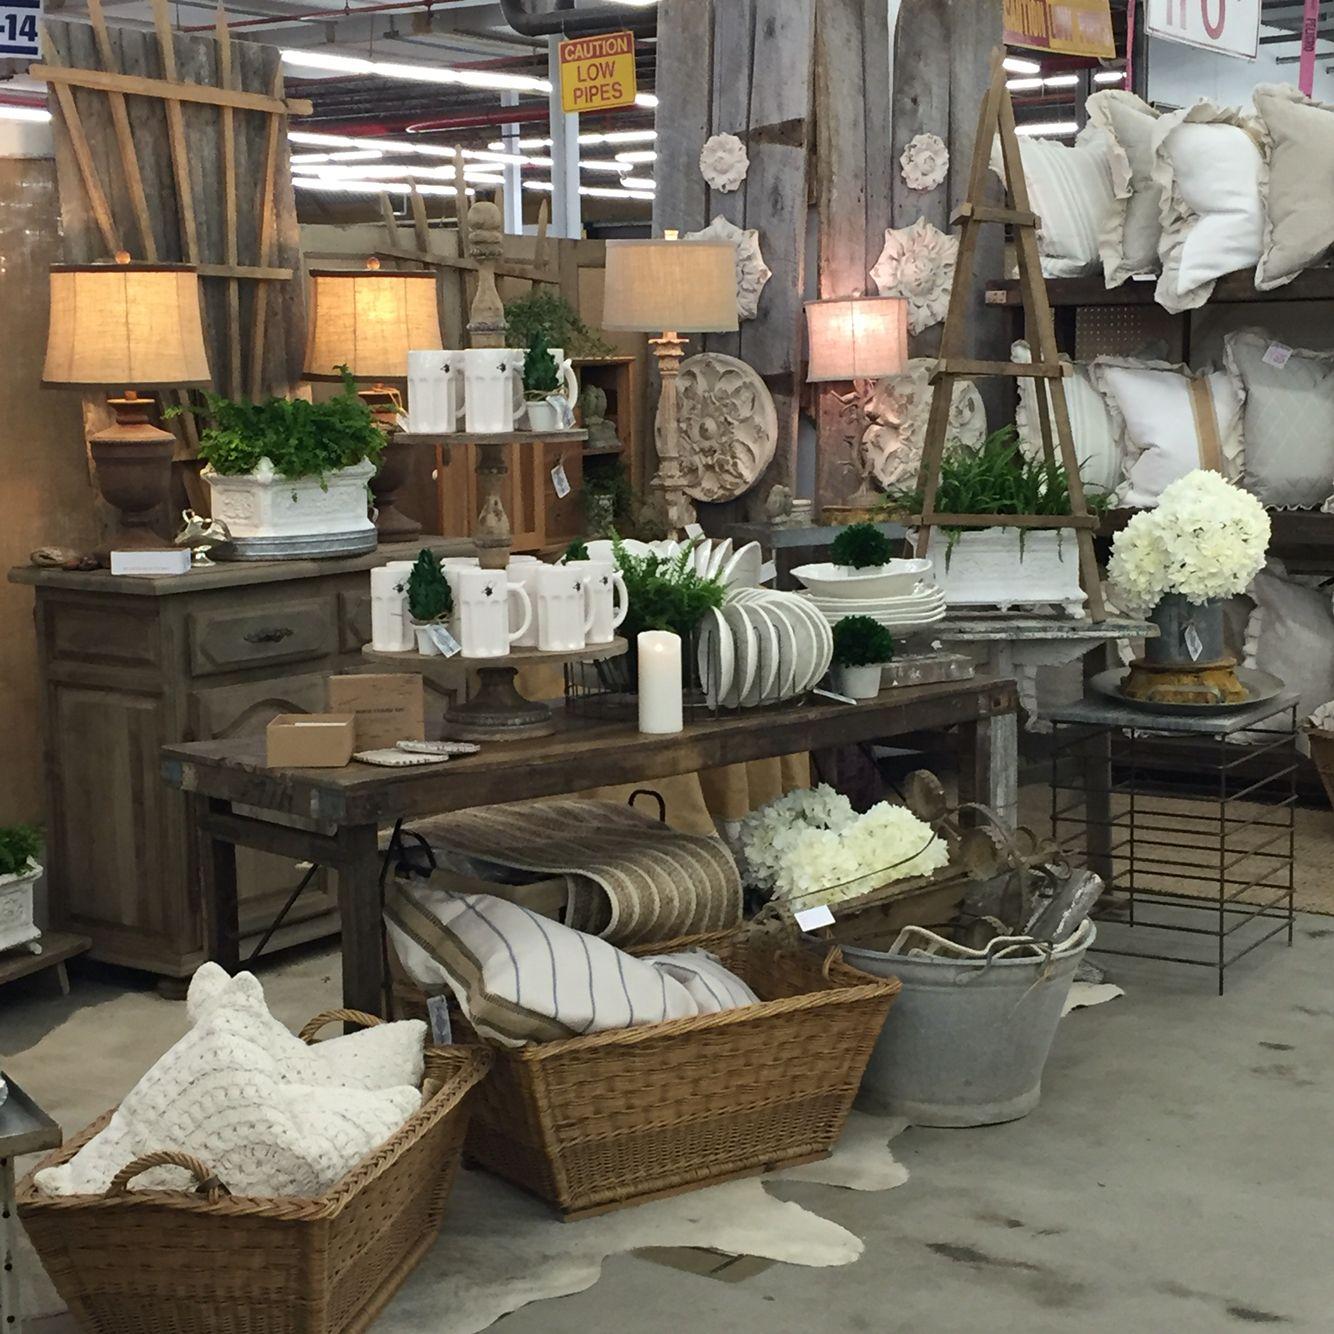 Handmade pillows, furniture & accessories